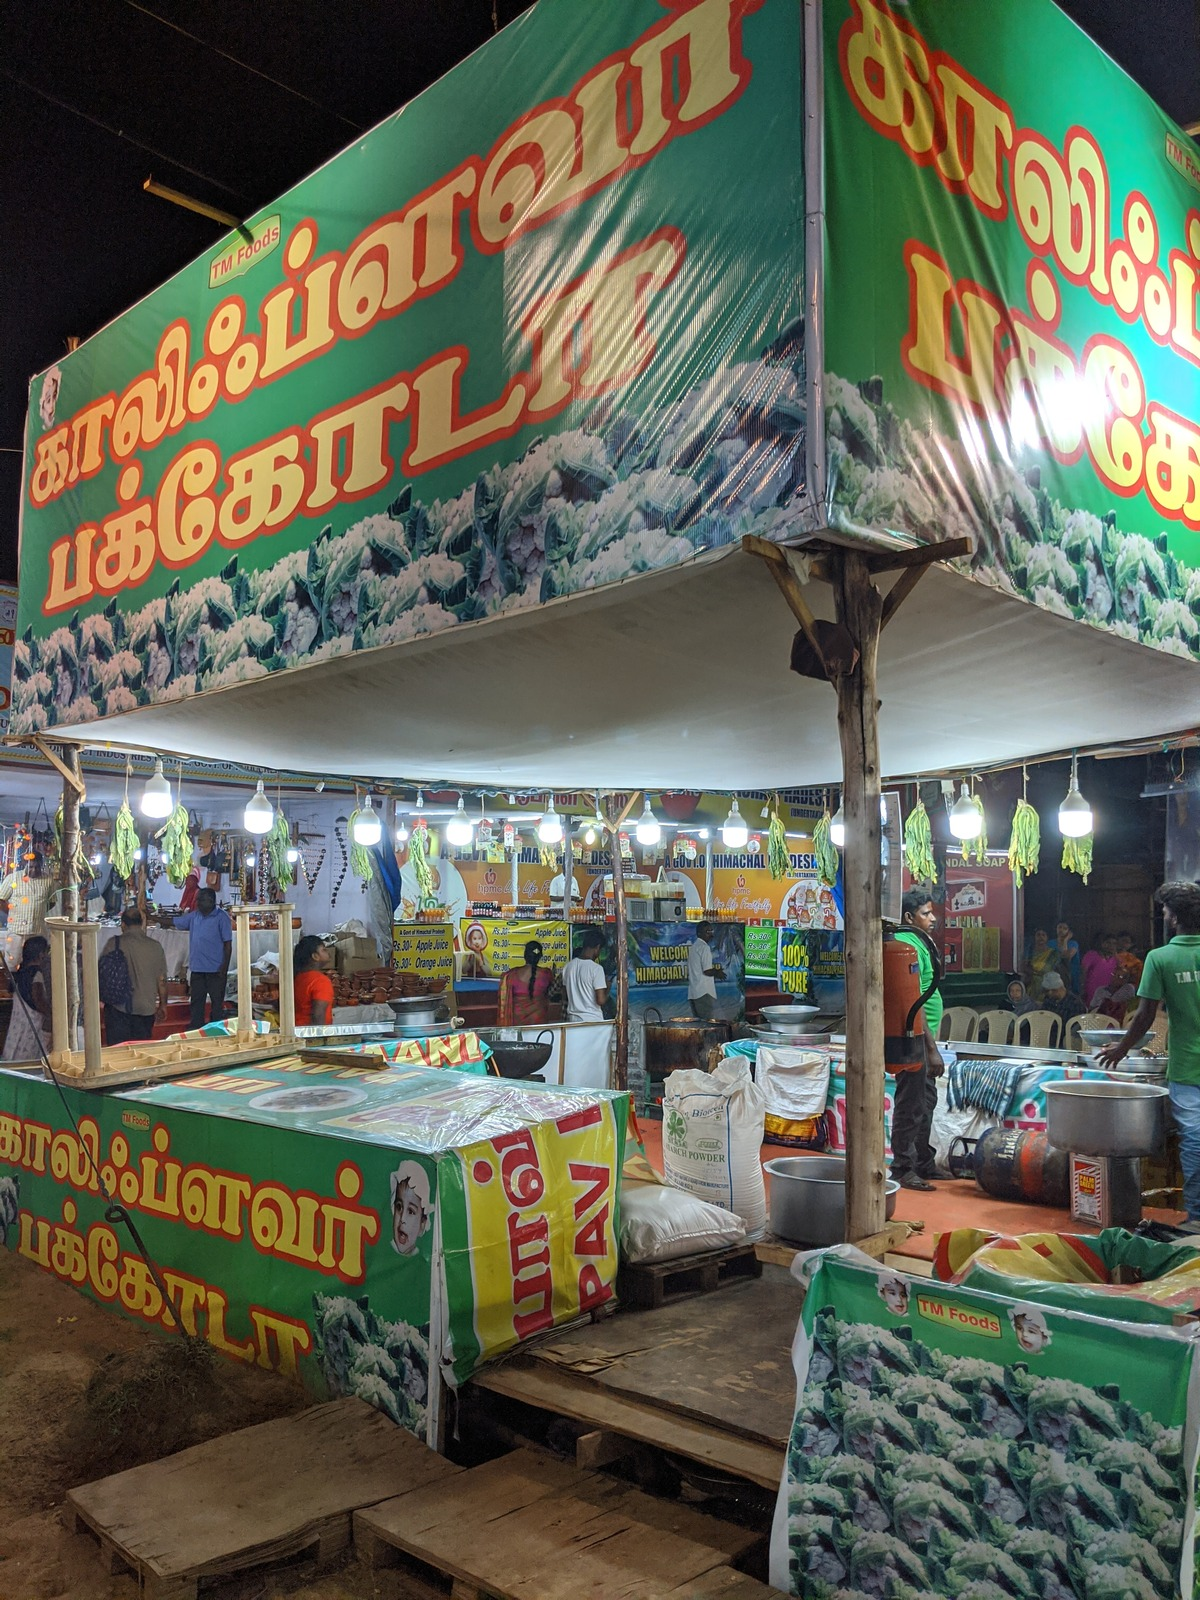 The pakoda and delhi appalam stall